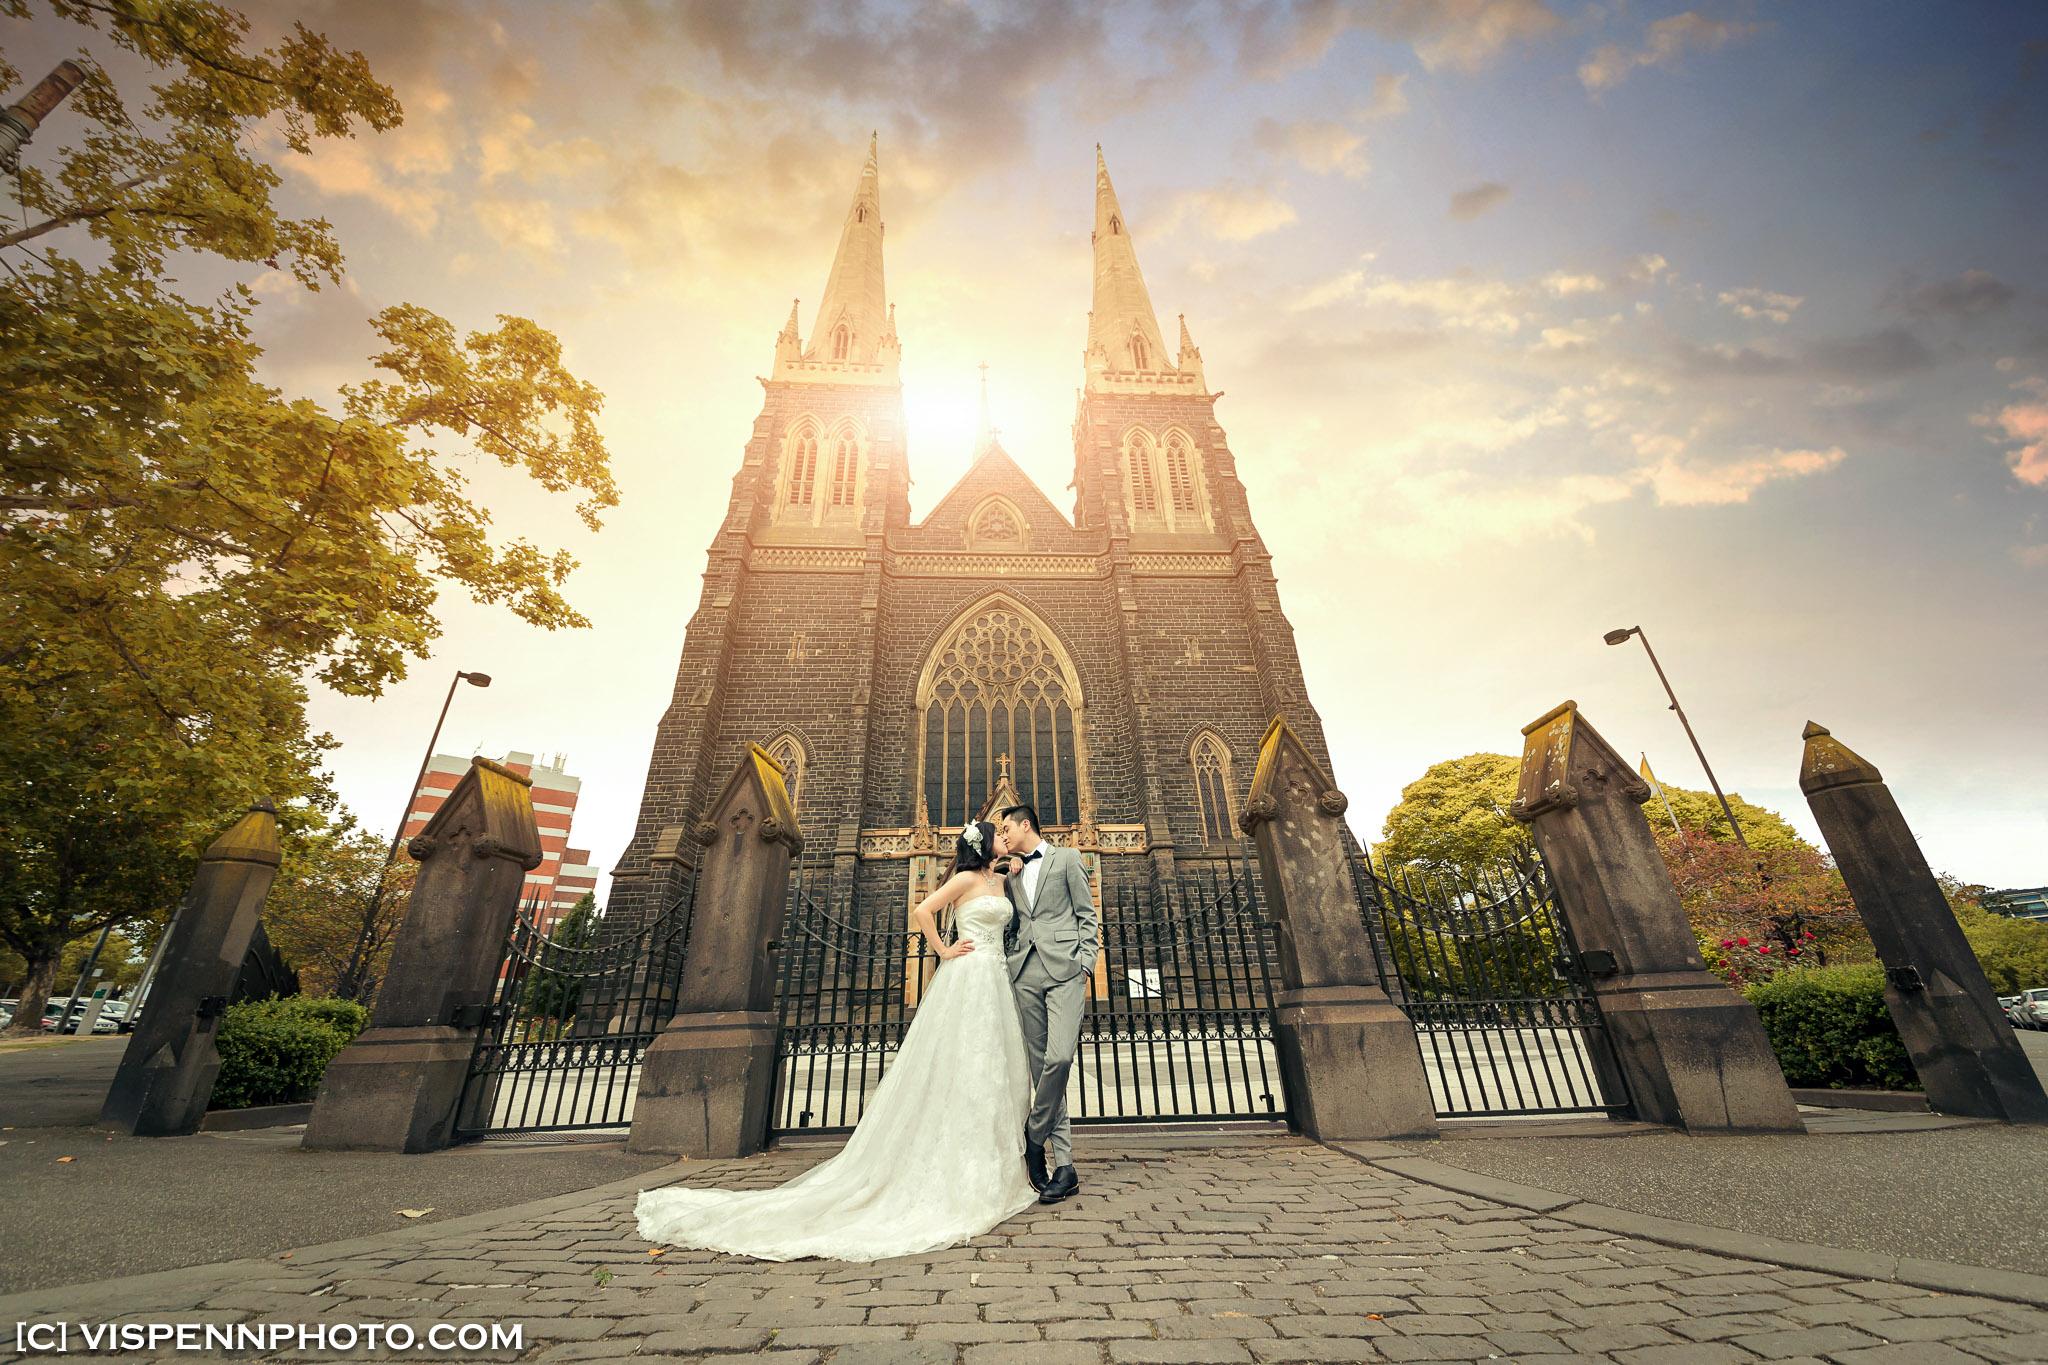 PRE WEDDING Photography Melbourne VISPENN 墨尔本 婚纱照 结婚照 婚纱摄影 Pauline 3069